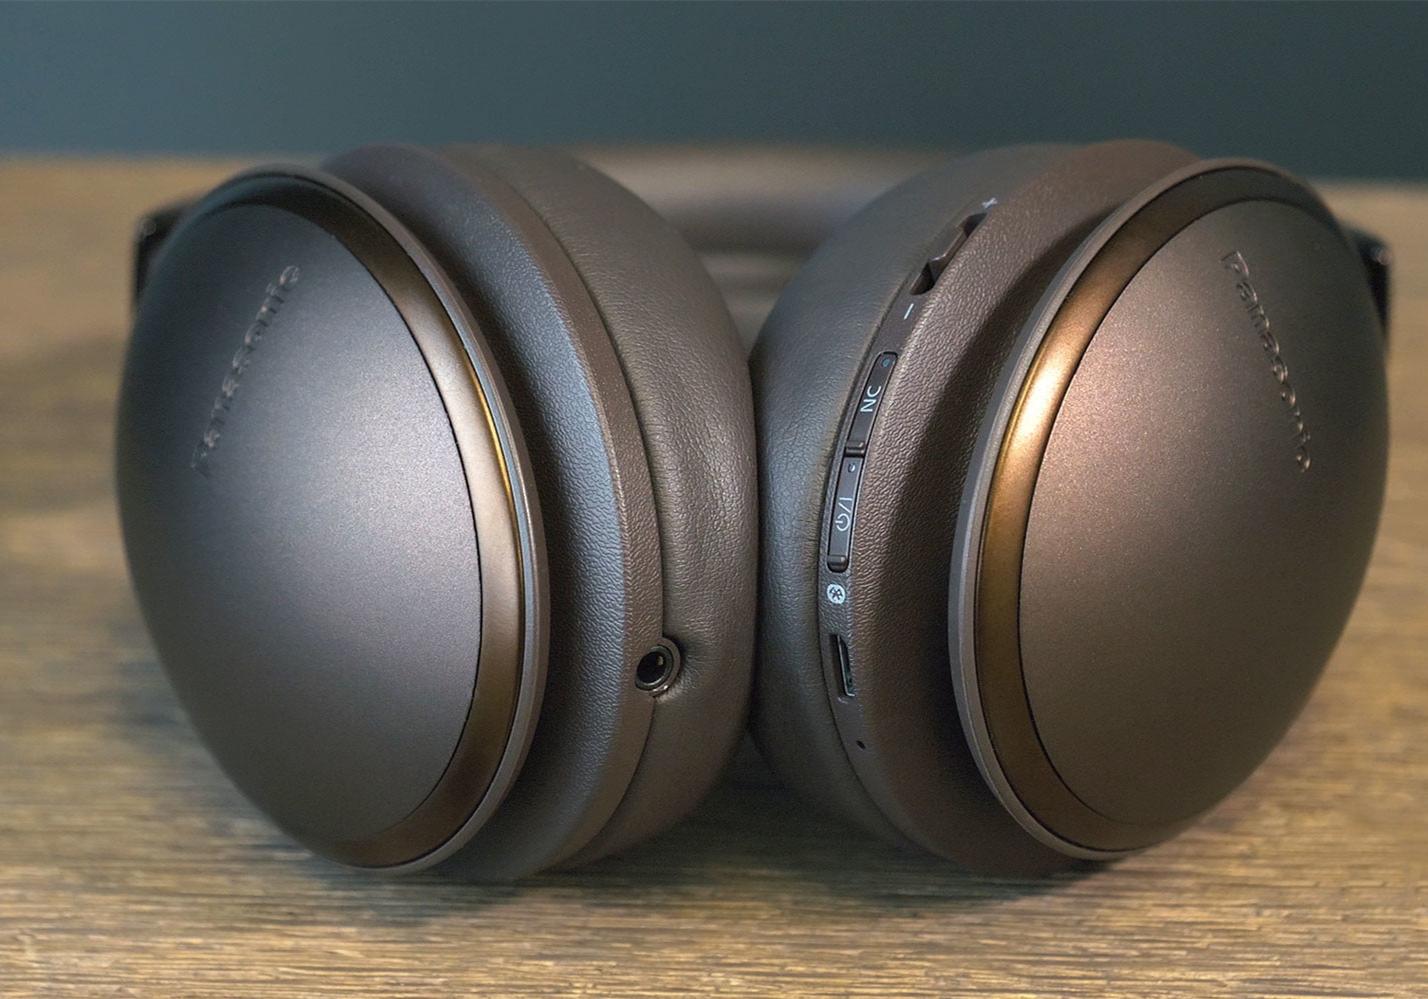 Panasonic 松下 RP-HD605N 降噪耳机拆解评测报告